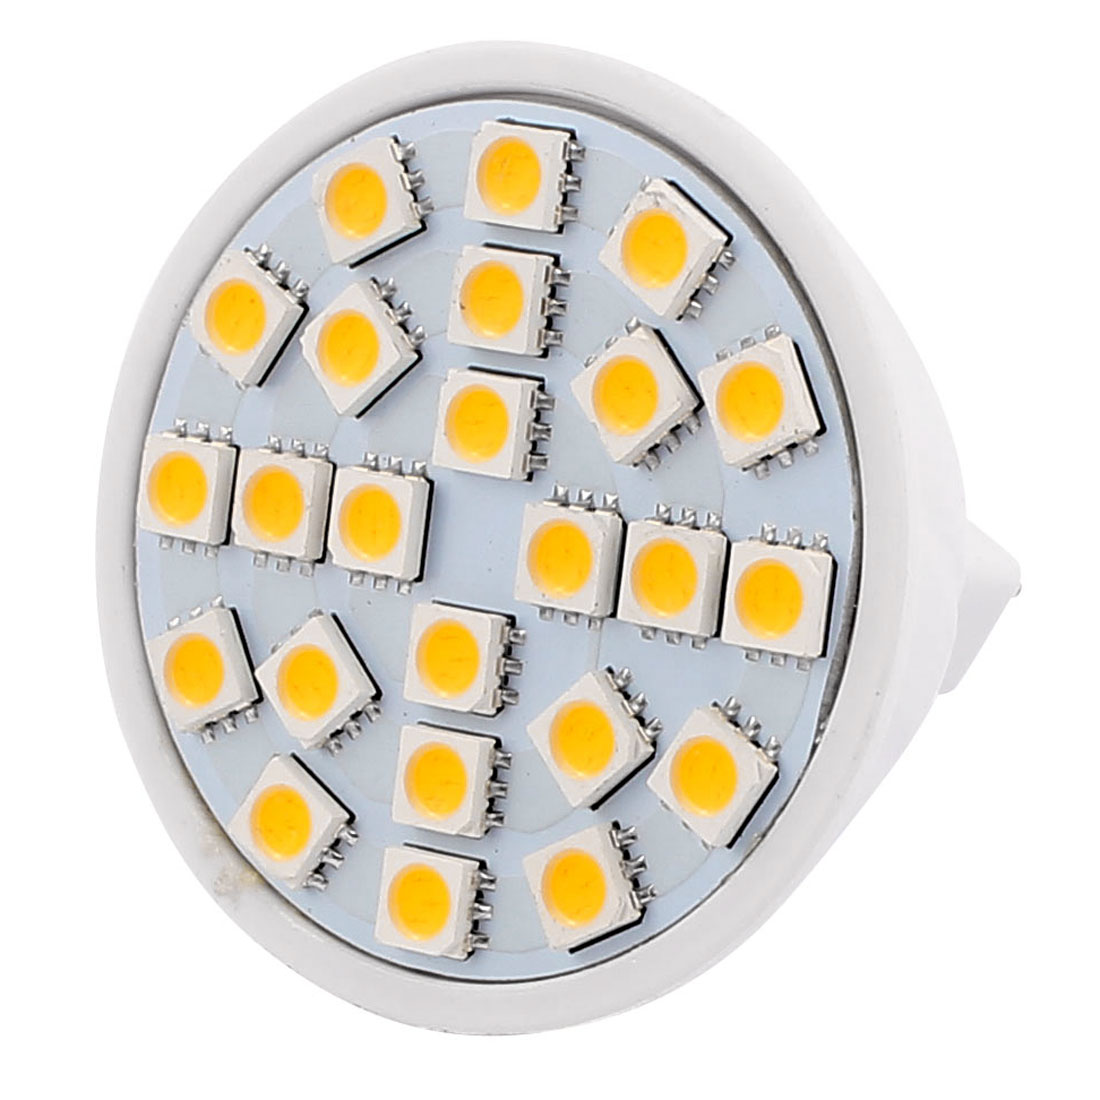 MR16 SMD 5050 24 LEDs AC 110V 3W Plastic Energy Saving LED Lamp Bulb Warm White